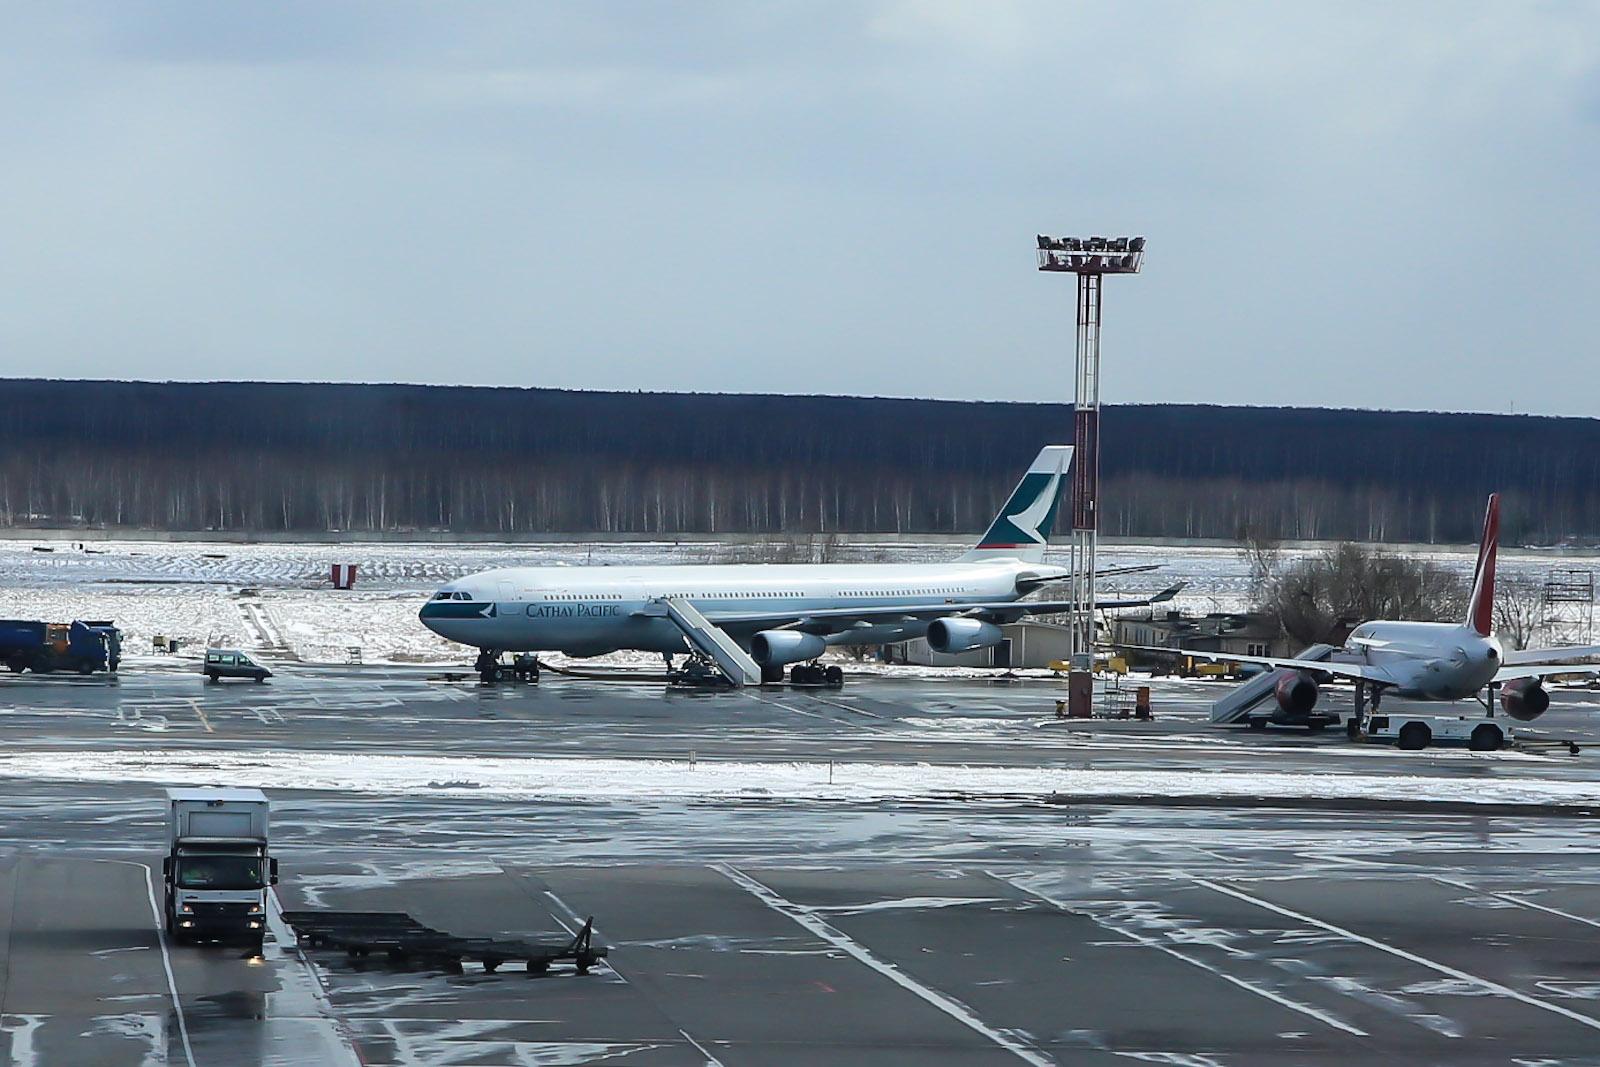 Airbus A340-300 B-HXI авиакомпани Cathay Pacific в аэропорту Домодедово